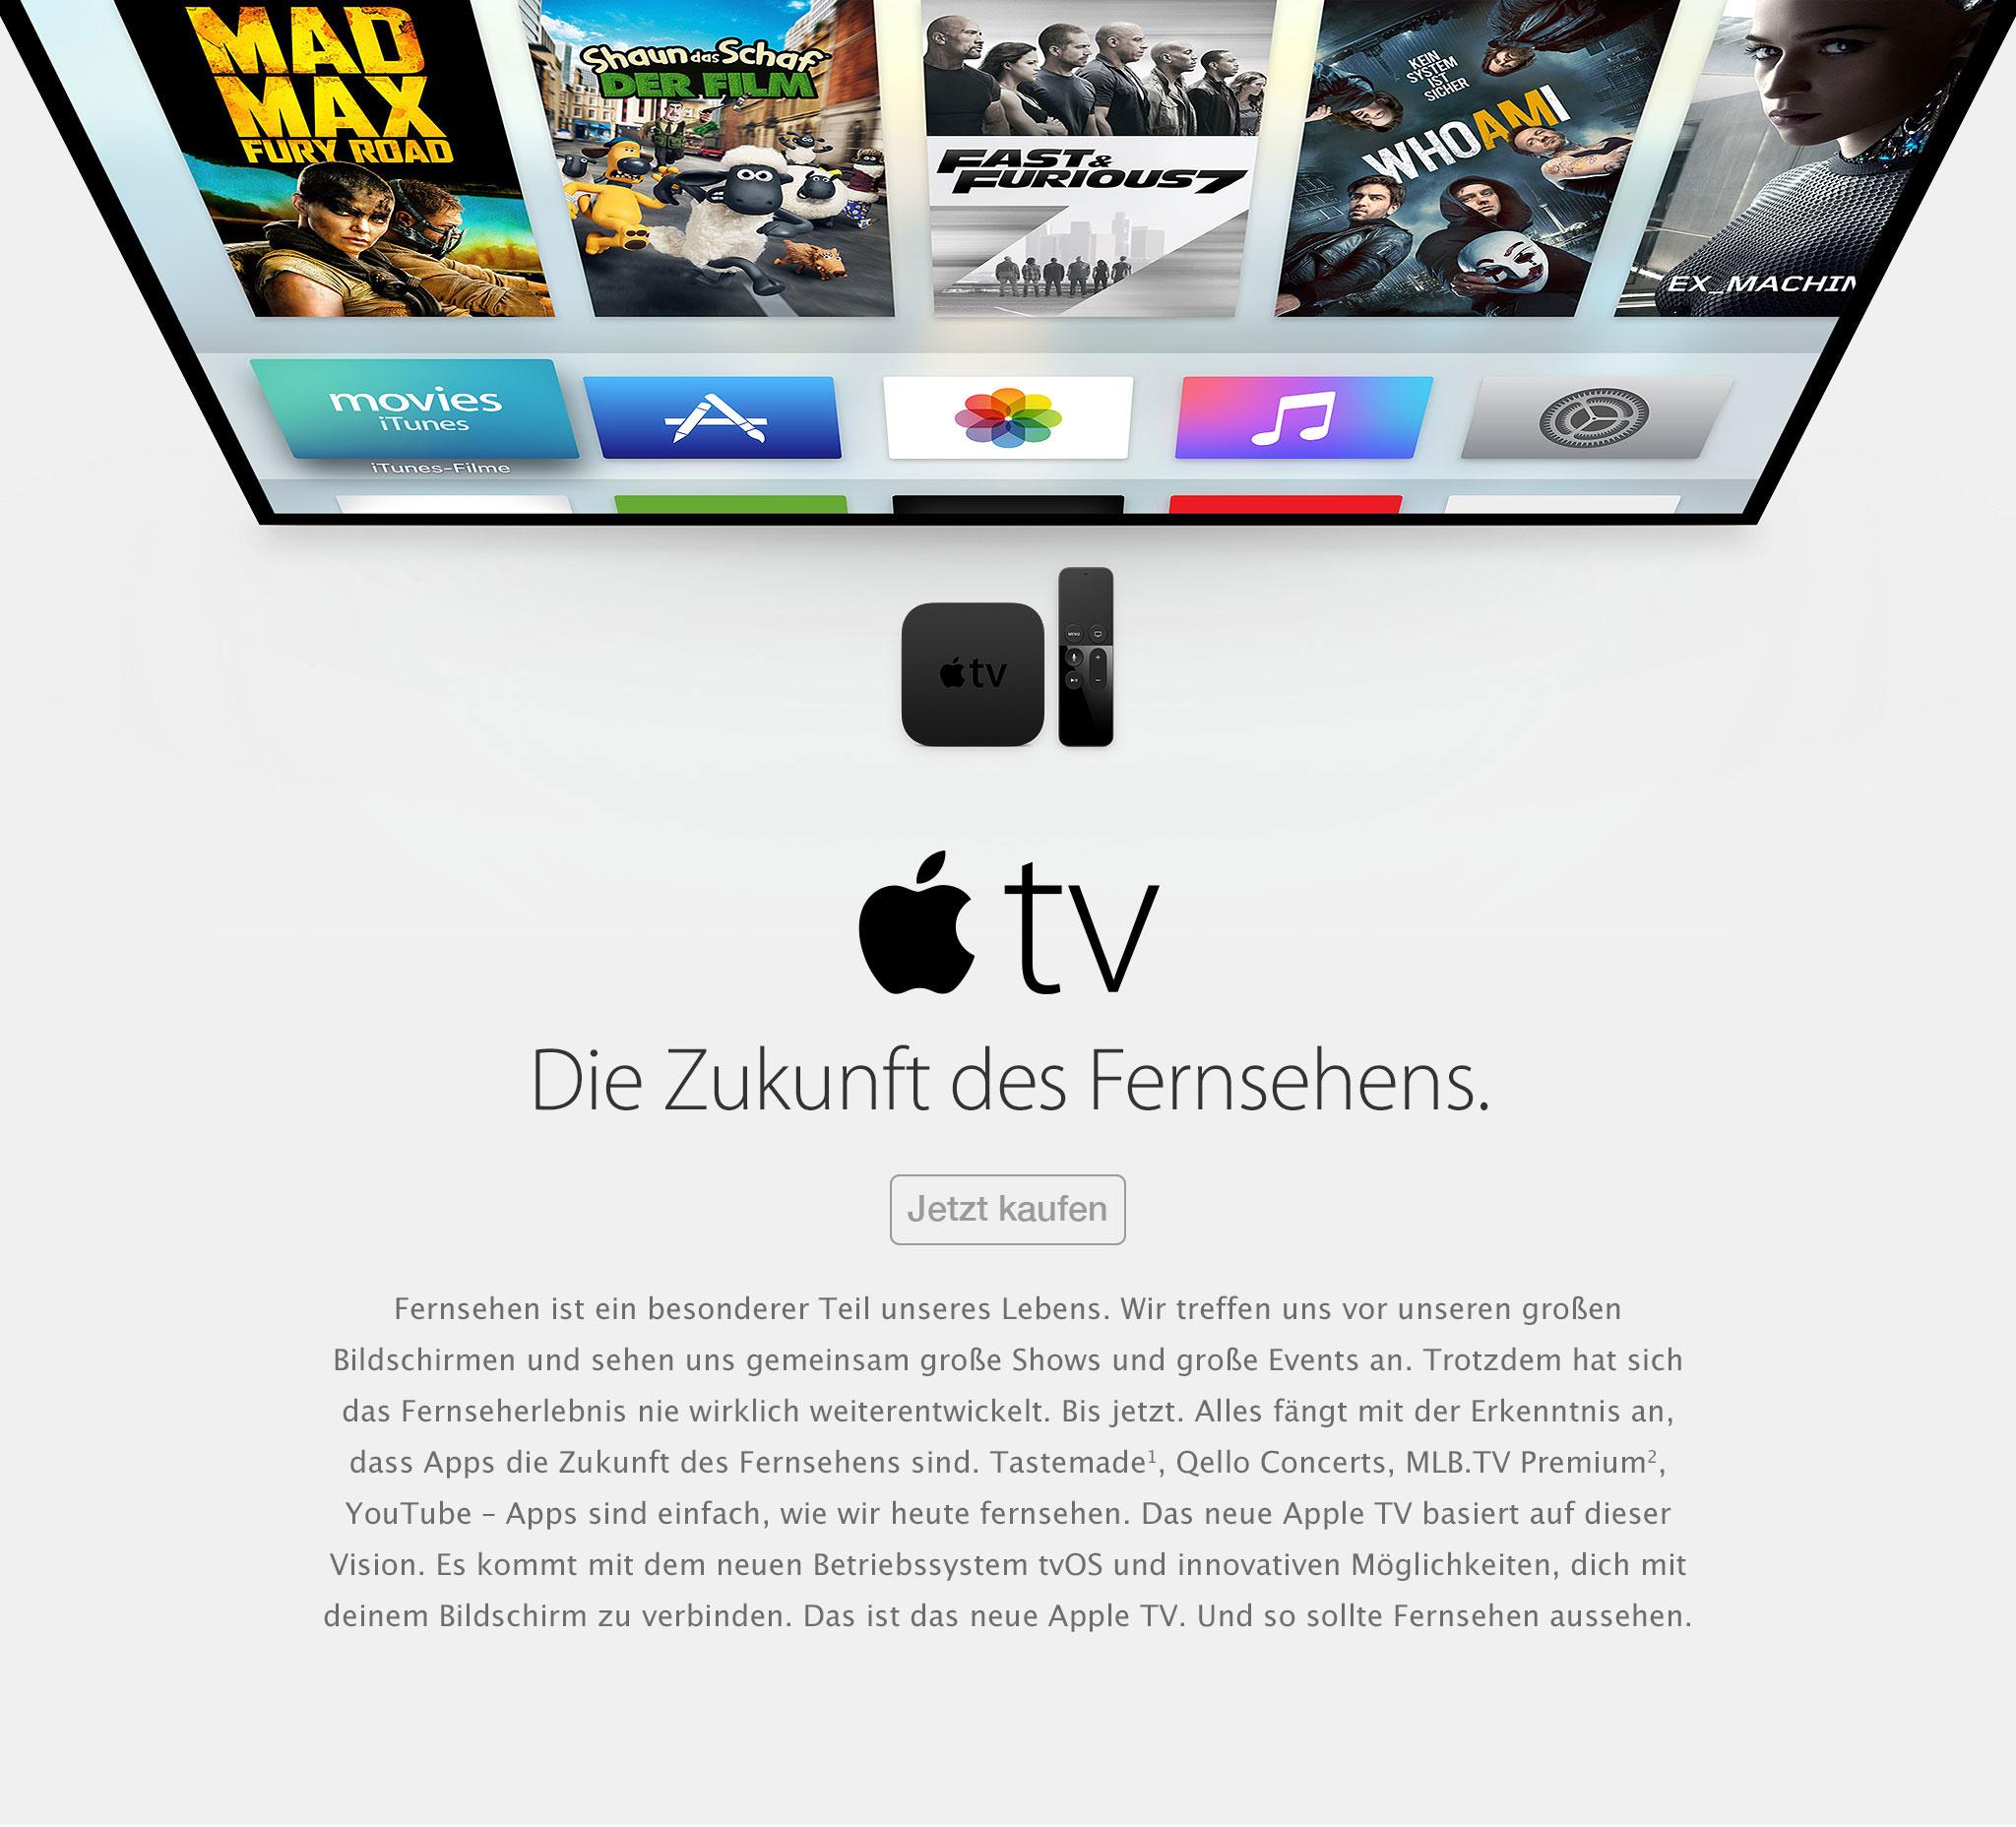 Beste Digitaler Bilderrahmen Shop Zukunft Zeitgenössisch - Rahmen ...